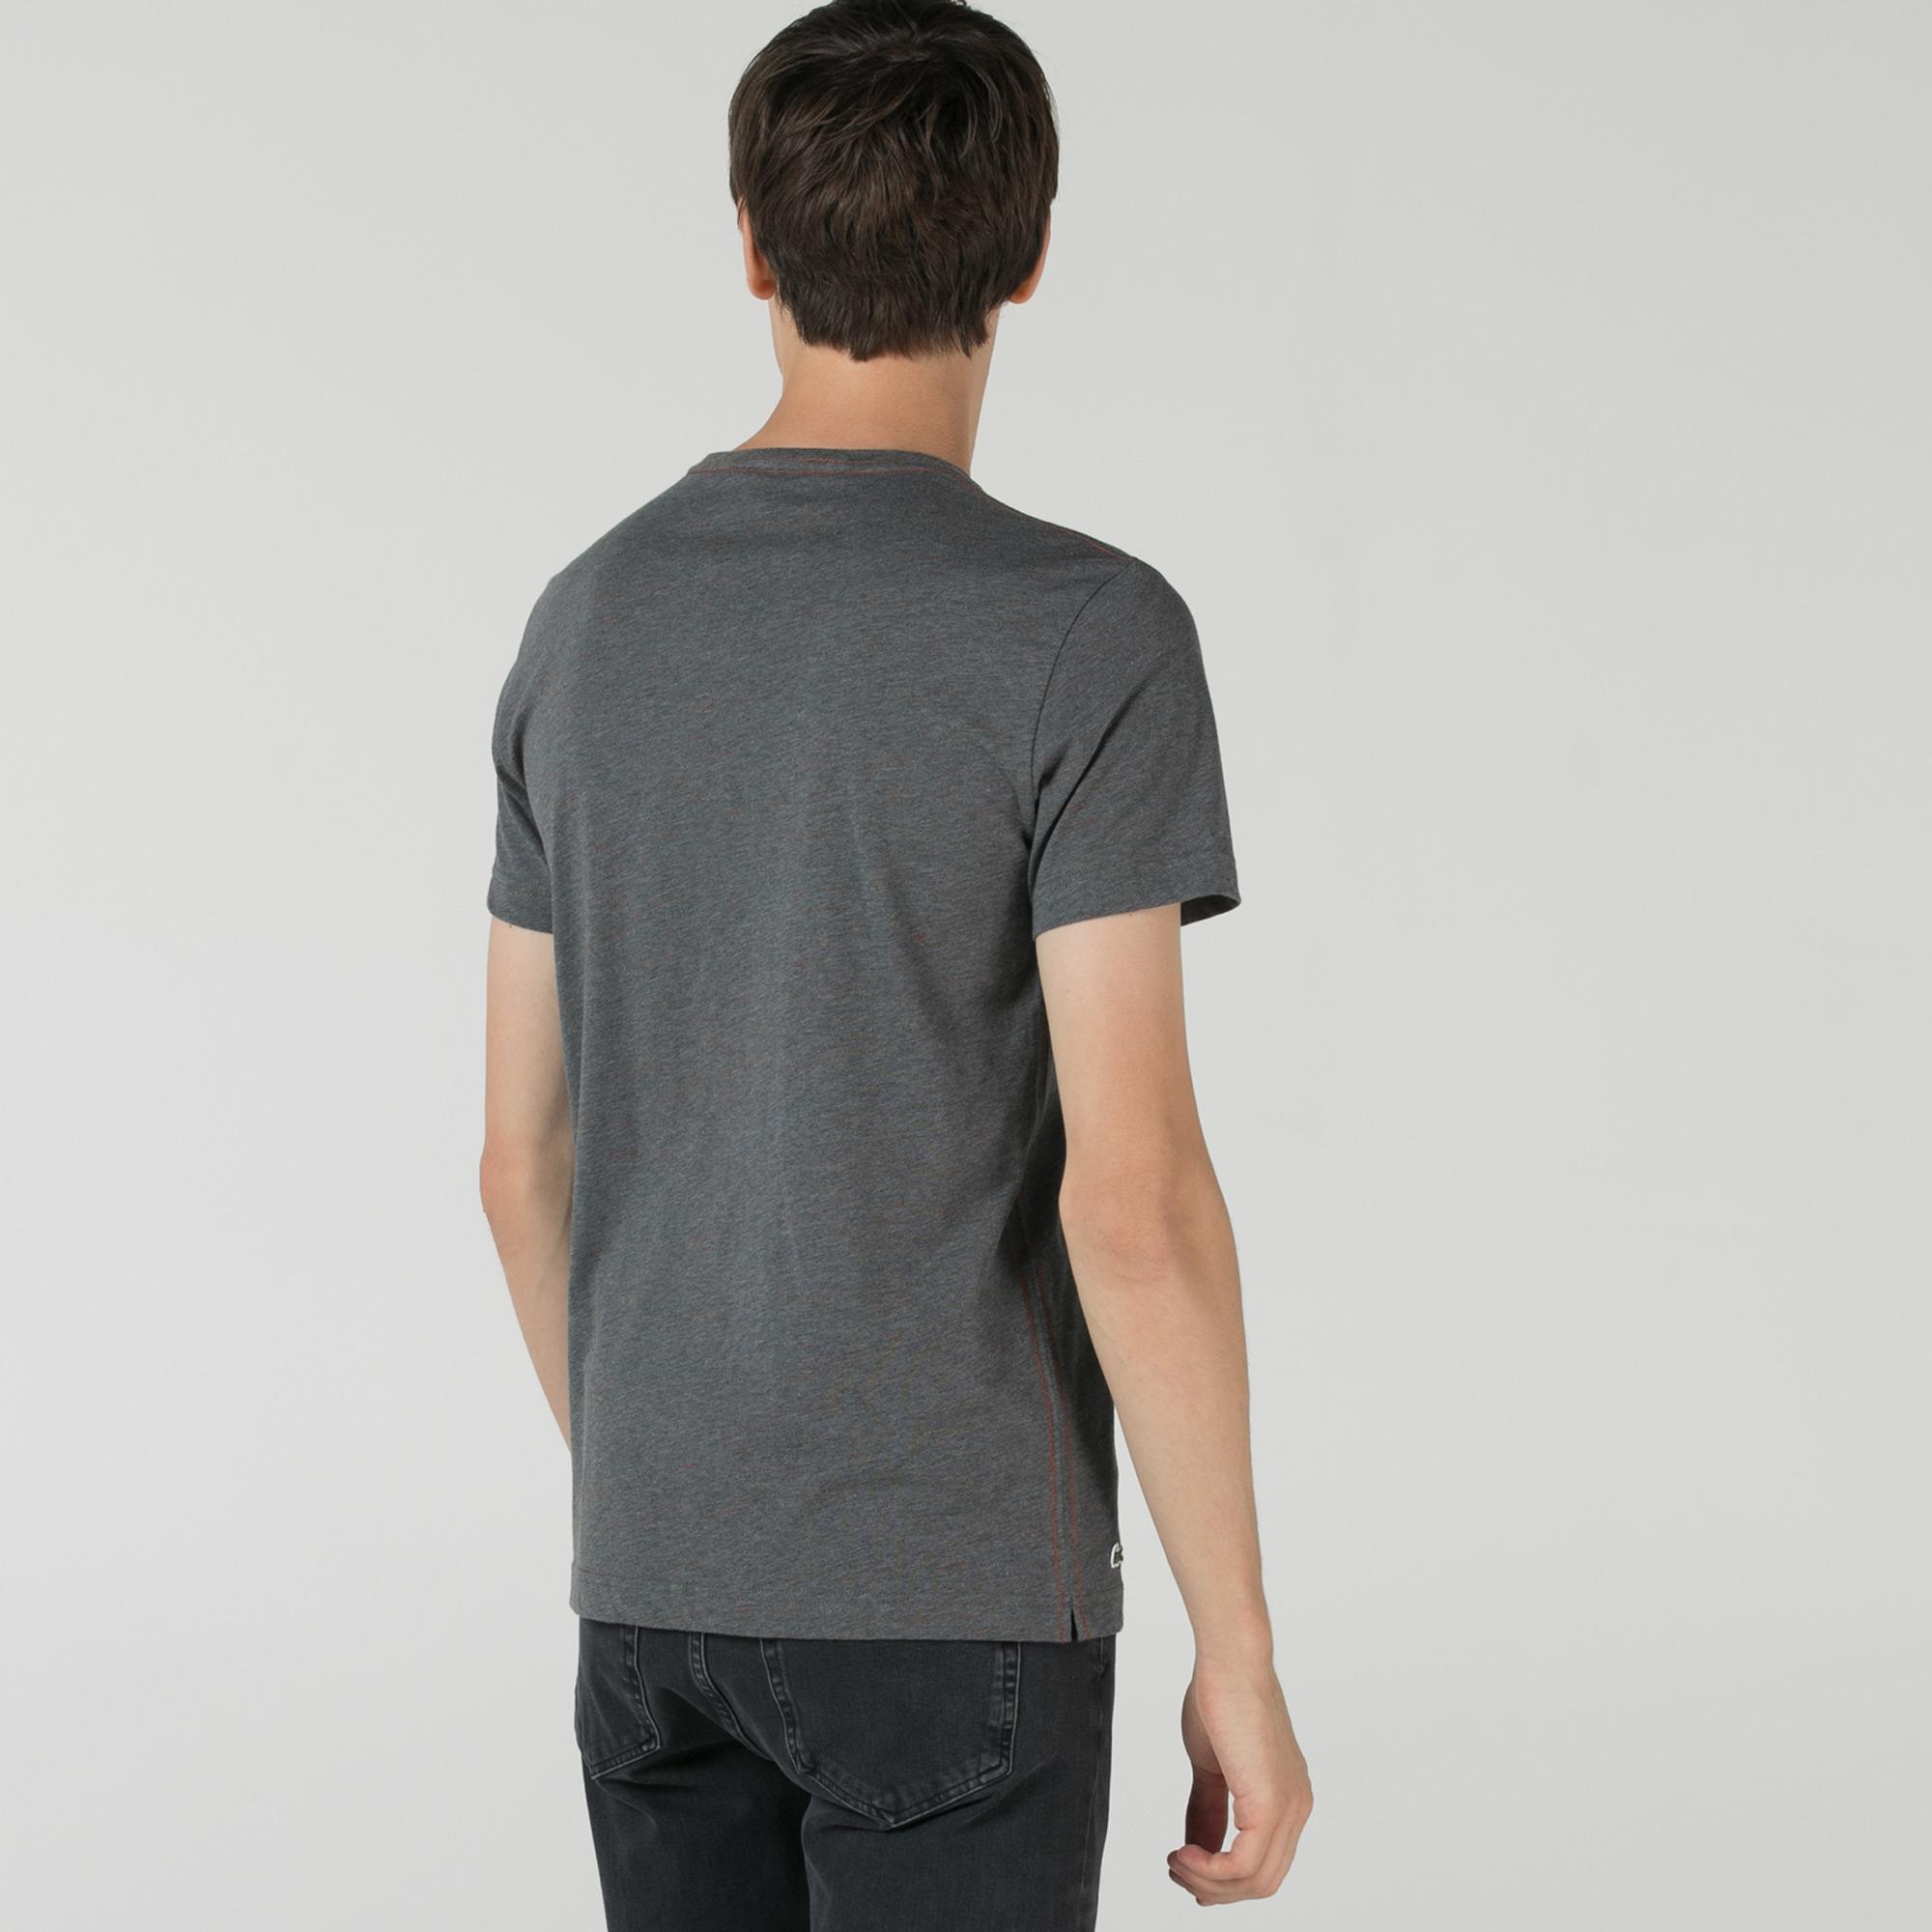 Lacoste Erkek Slim Fit Bisiklet Yaka Baskılı Koyu Gri T-Shirt